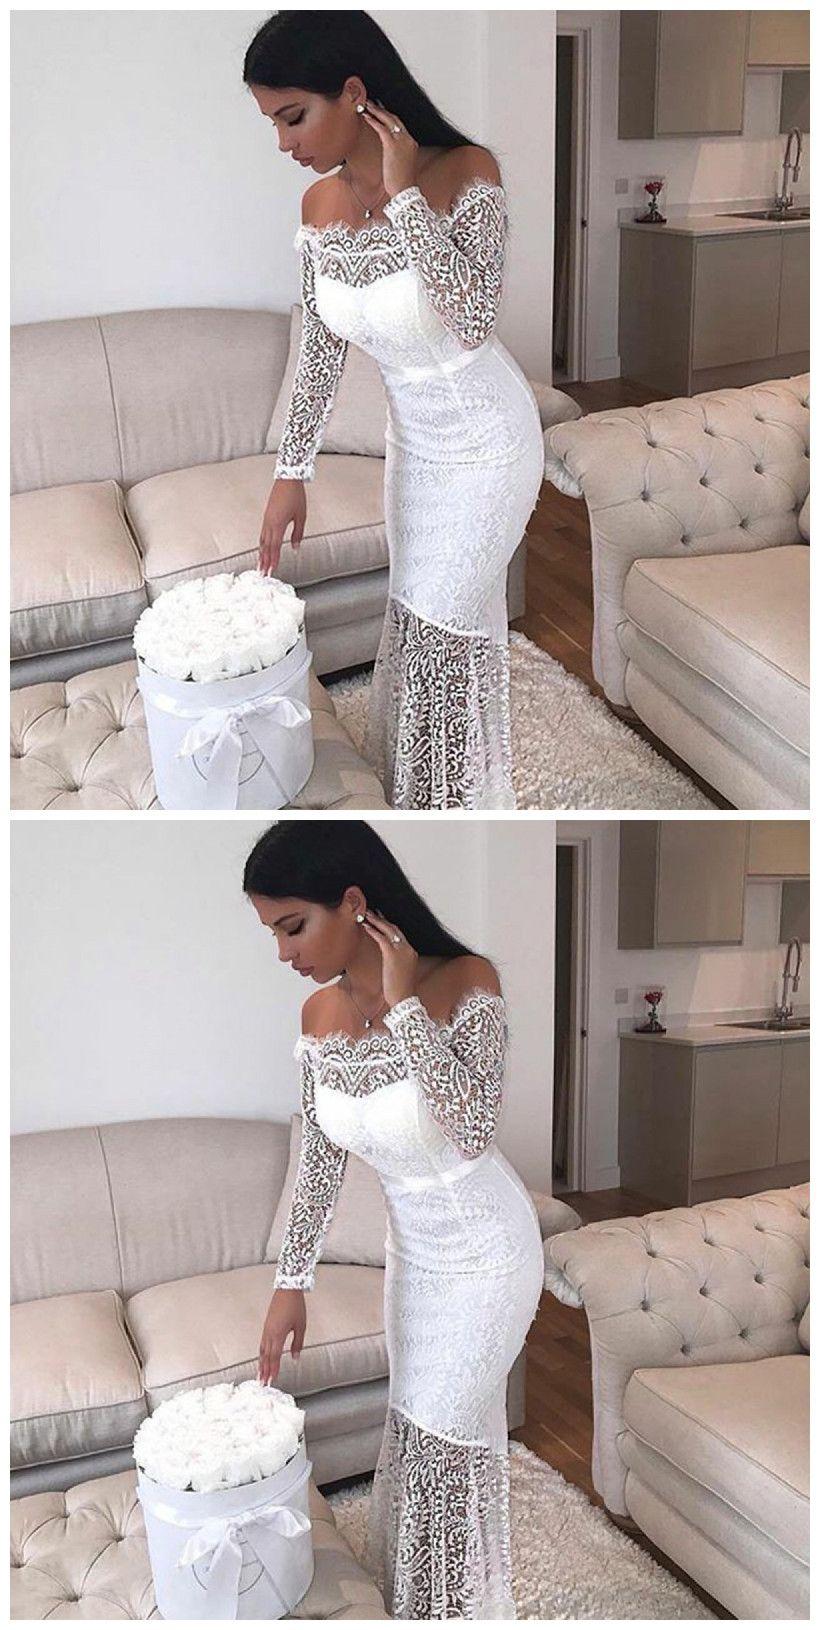 3afc6b2ae87 Mermaid Off the Shoulder Long Sleeve Floor-Length White #prom #prom dress # dress #evening dress #evening #fashion #love #shopping #art #dress #women  ...